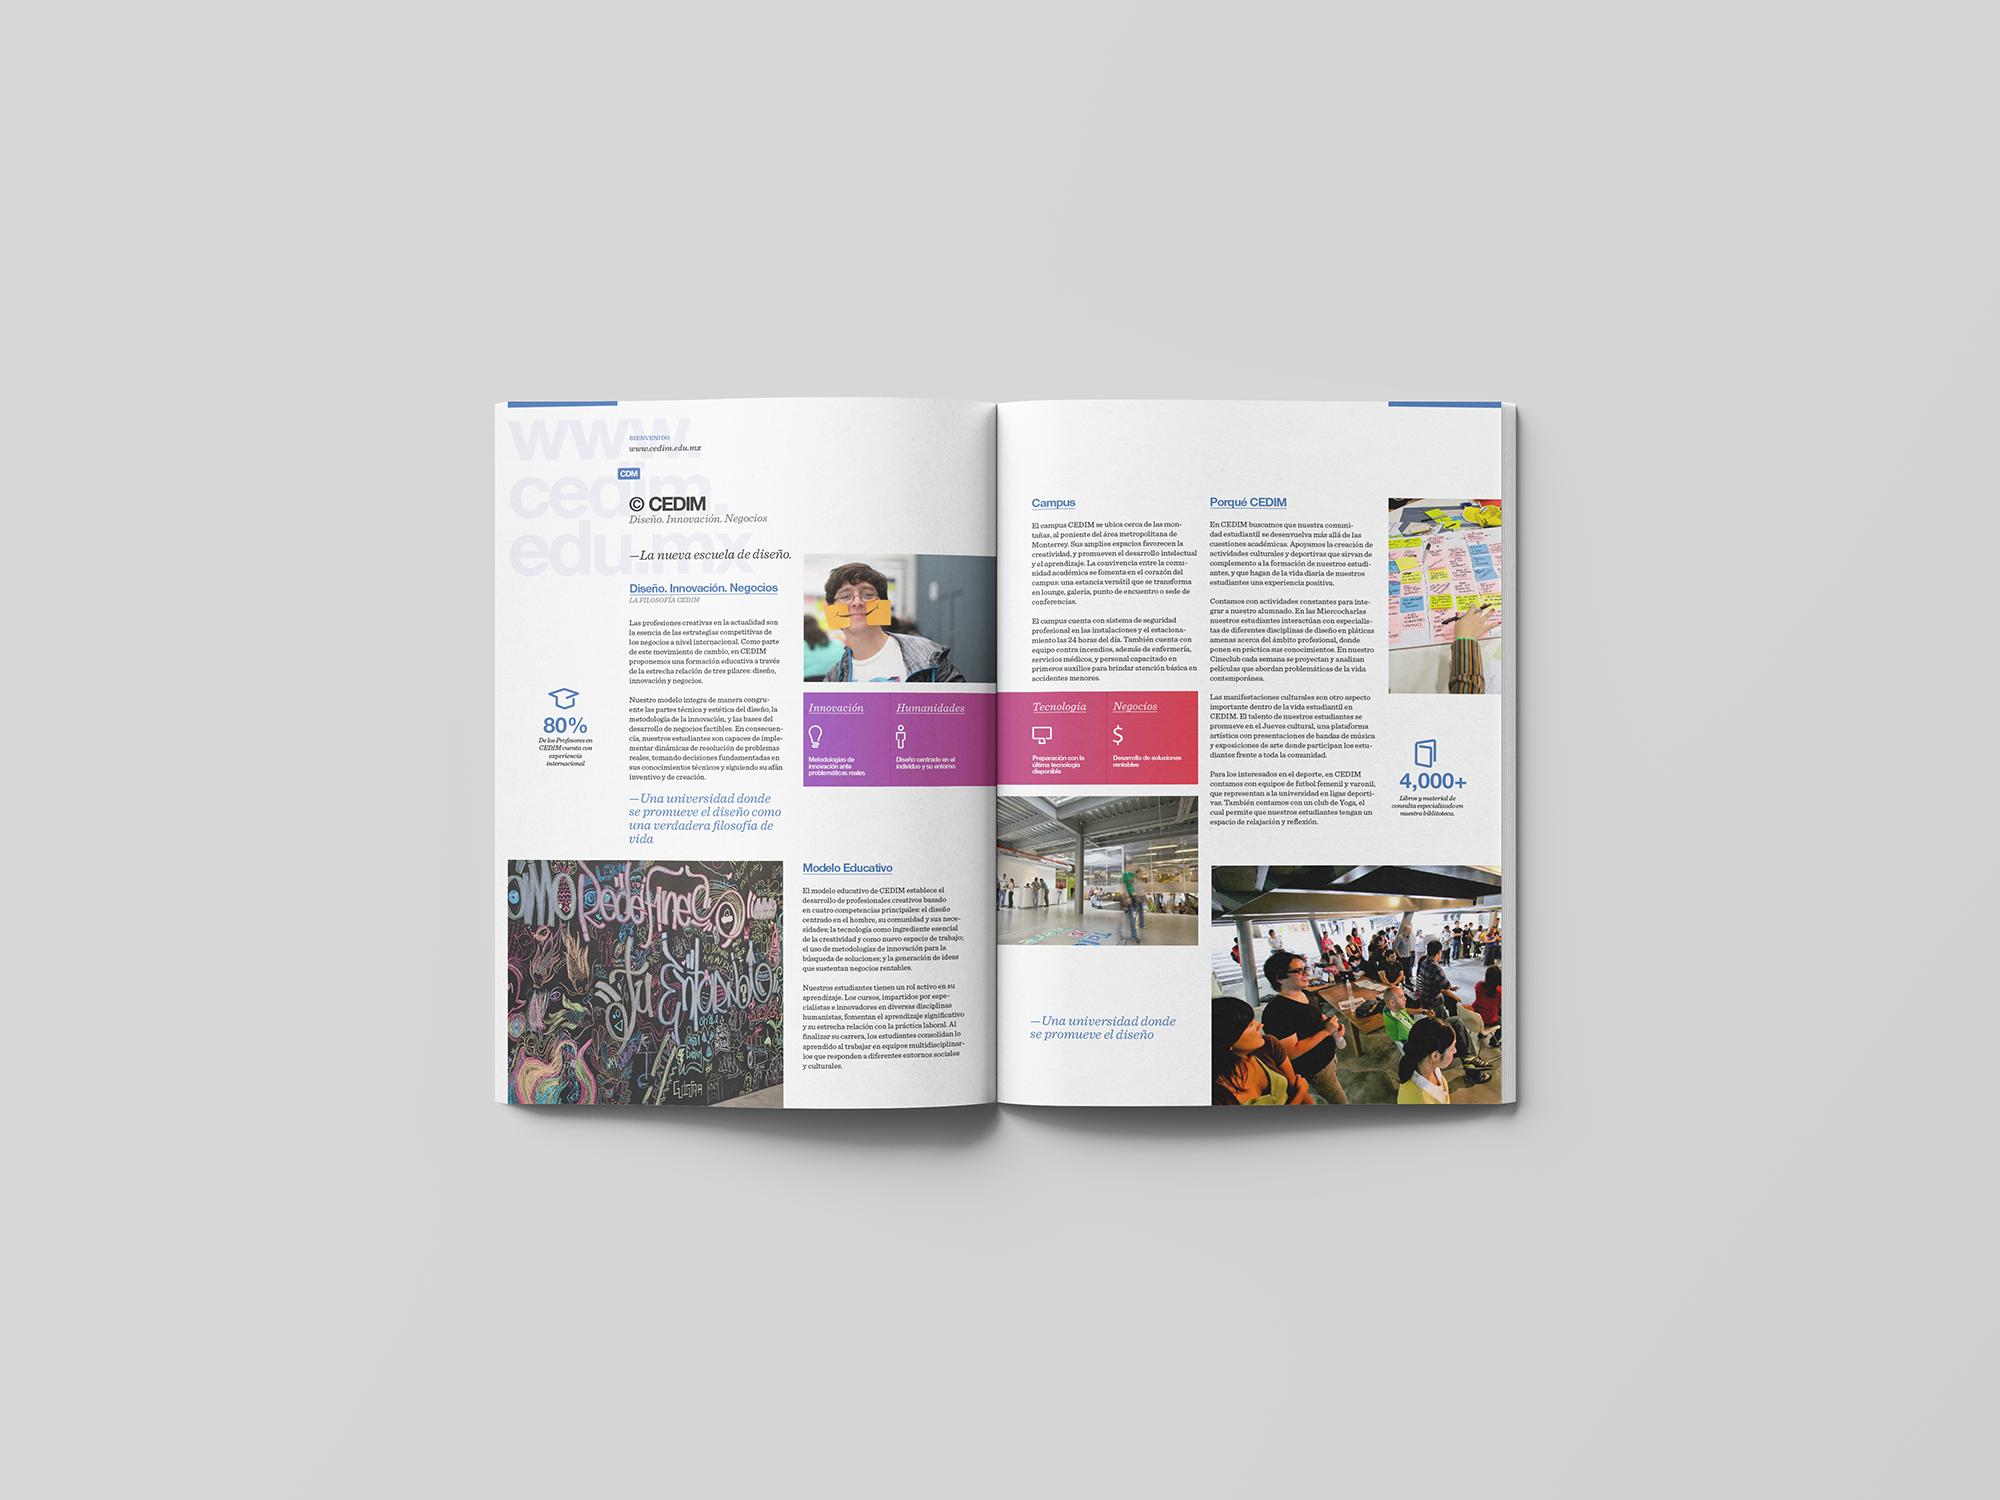 spread01-cedim-brochure-yoenpaperland